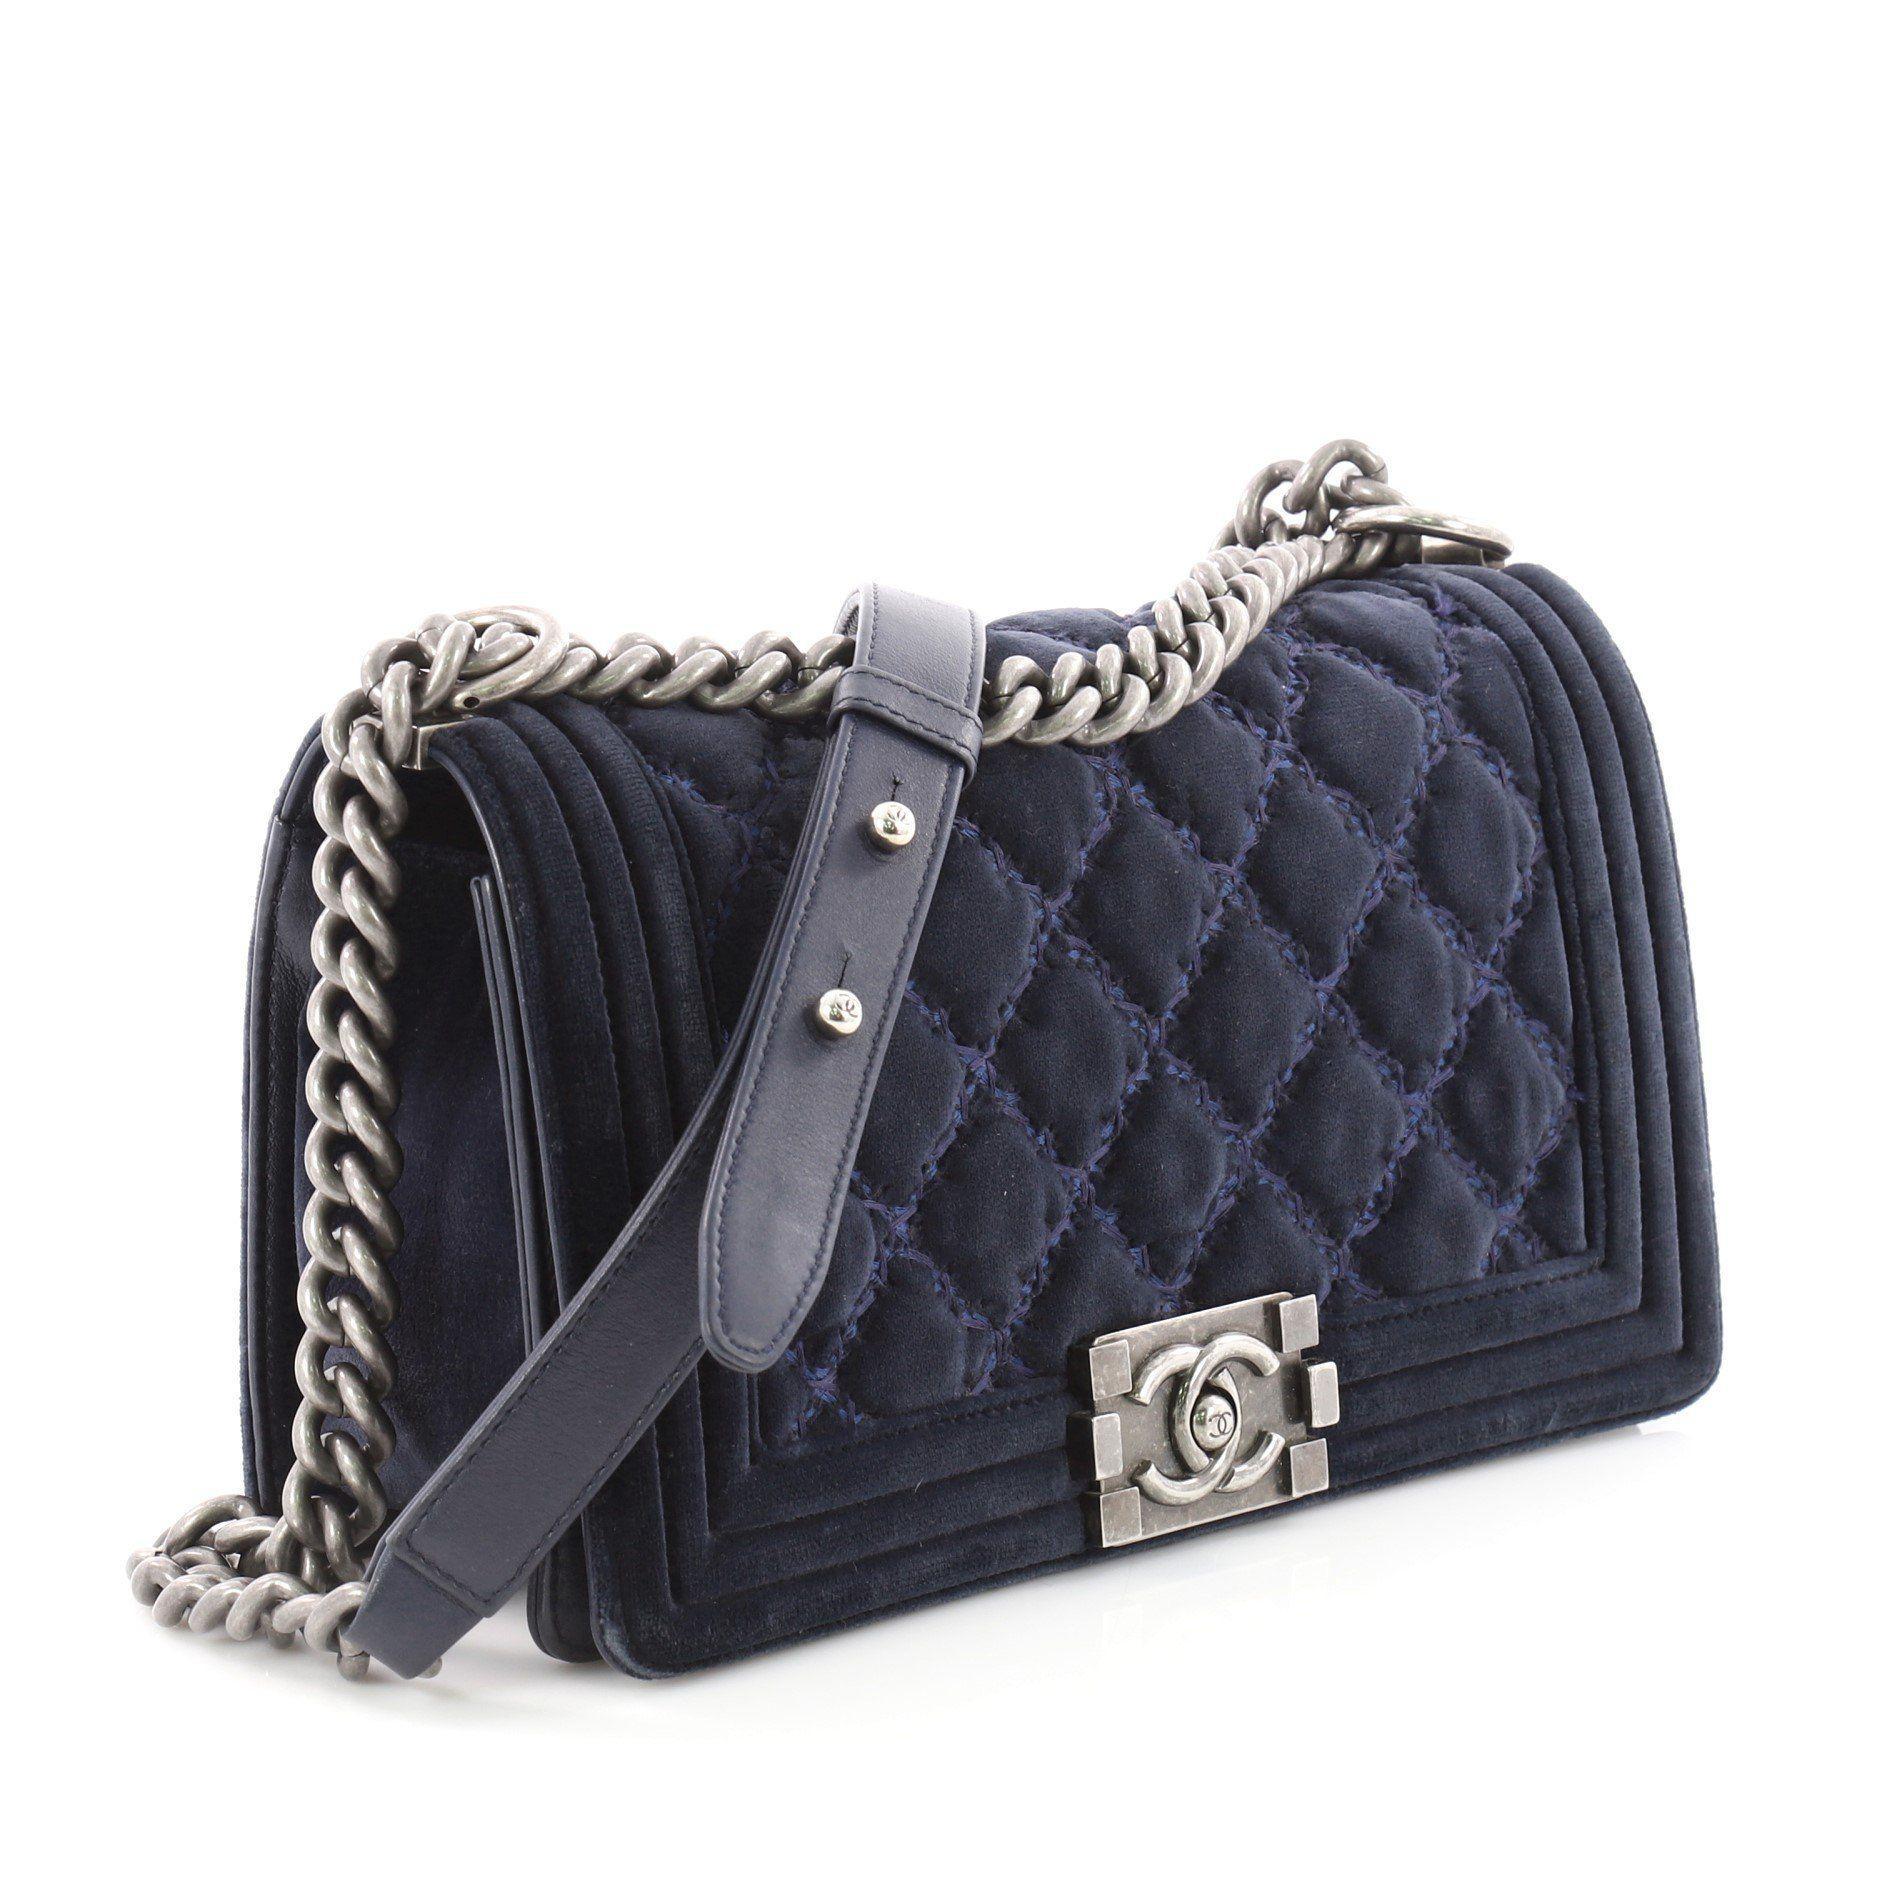 4e866c65a3f2 Chanel Velvet Boy Quilted Flap Bag - Best Quilt Grafimage.co